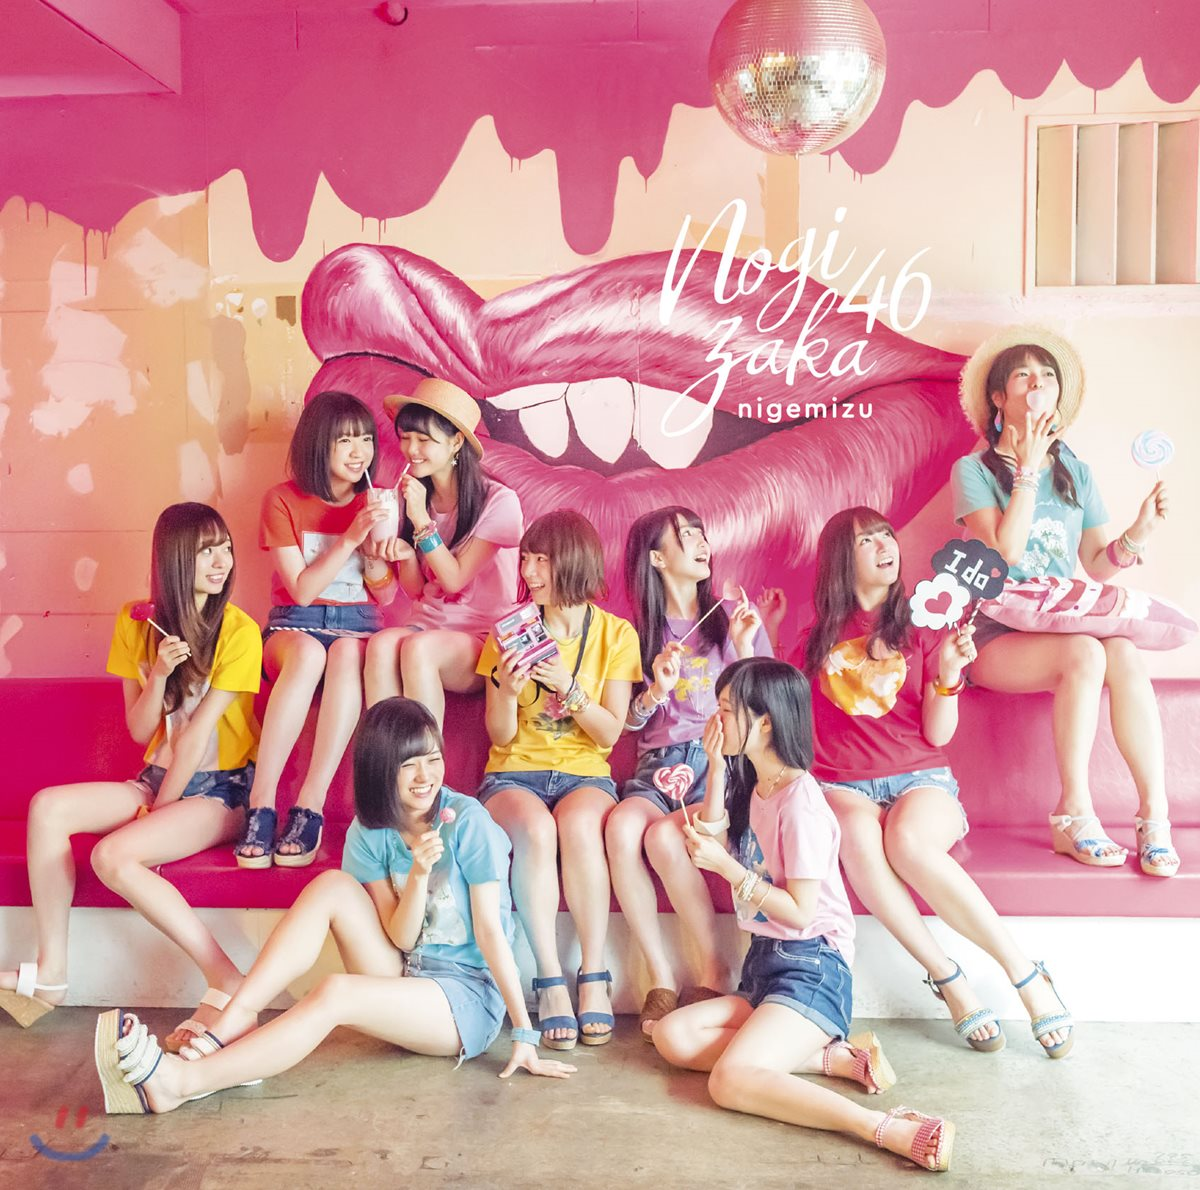 Nogizaka46 - 신기루 (逃げ水) 노기자카46 18번째 싱글 앨범